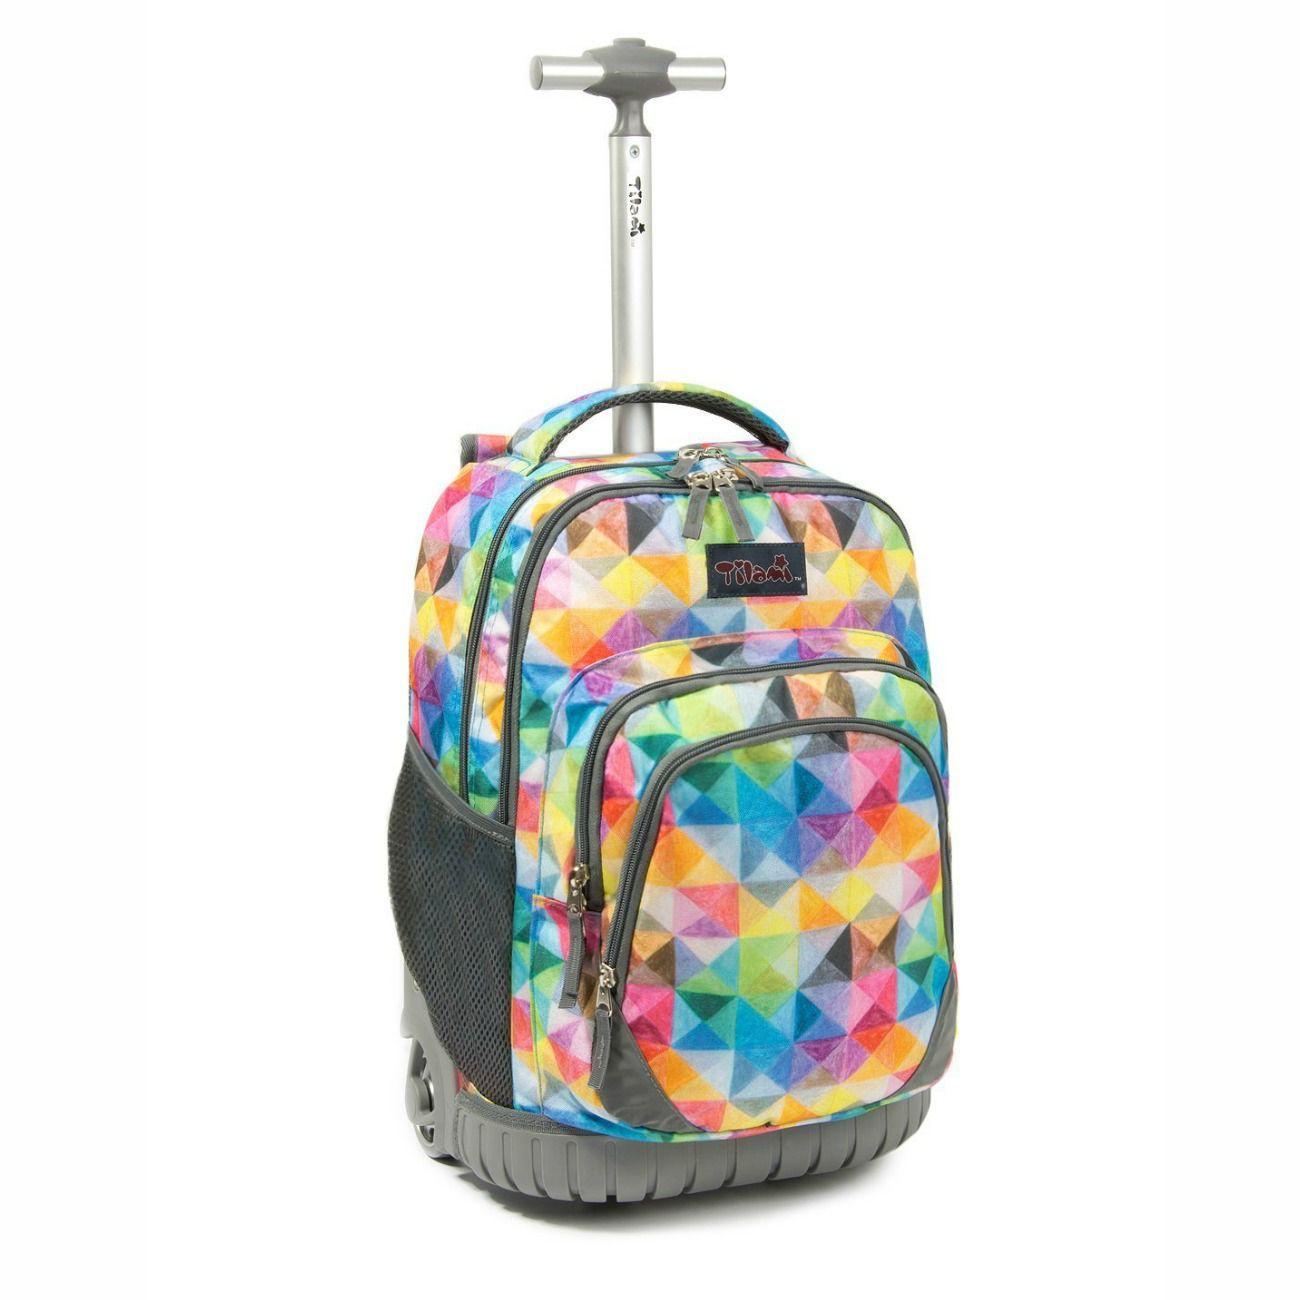 21 Best Backpacks for Kids in 2018 - Cool Kids Backpacks   Book Bags c63c5da810267